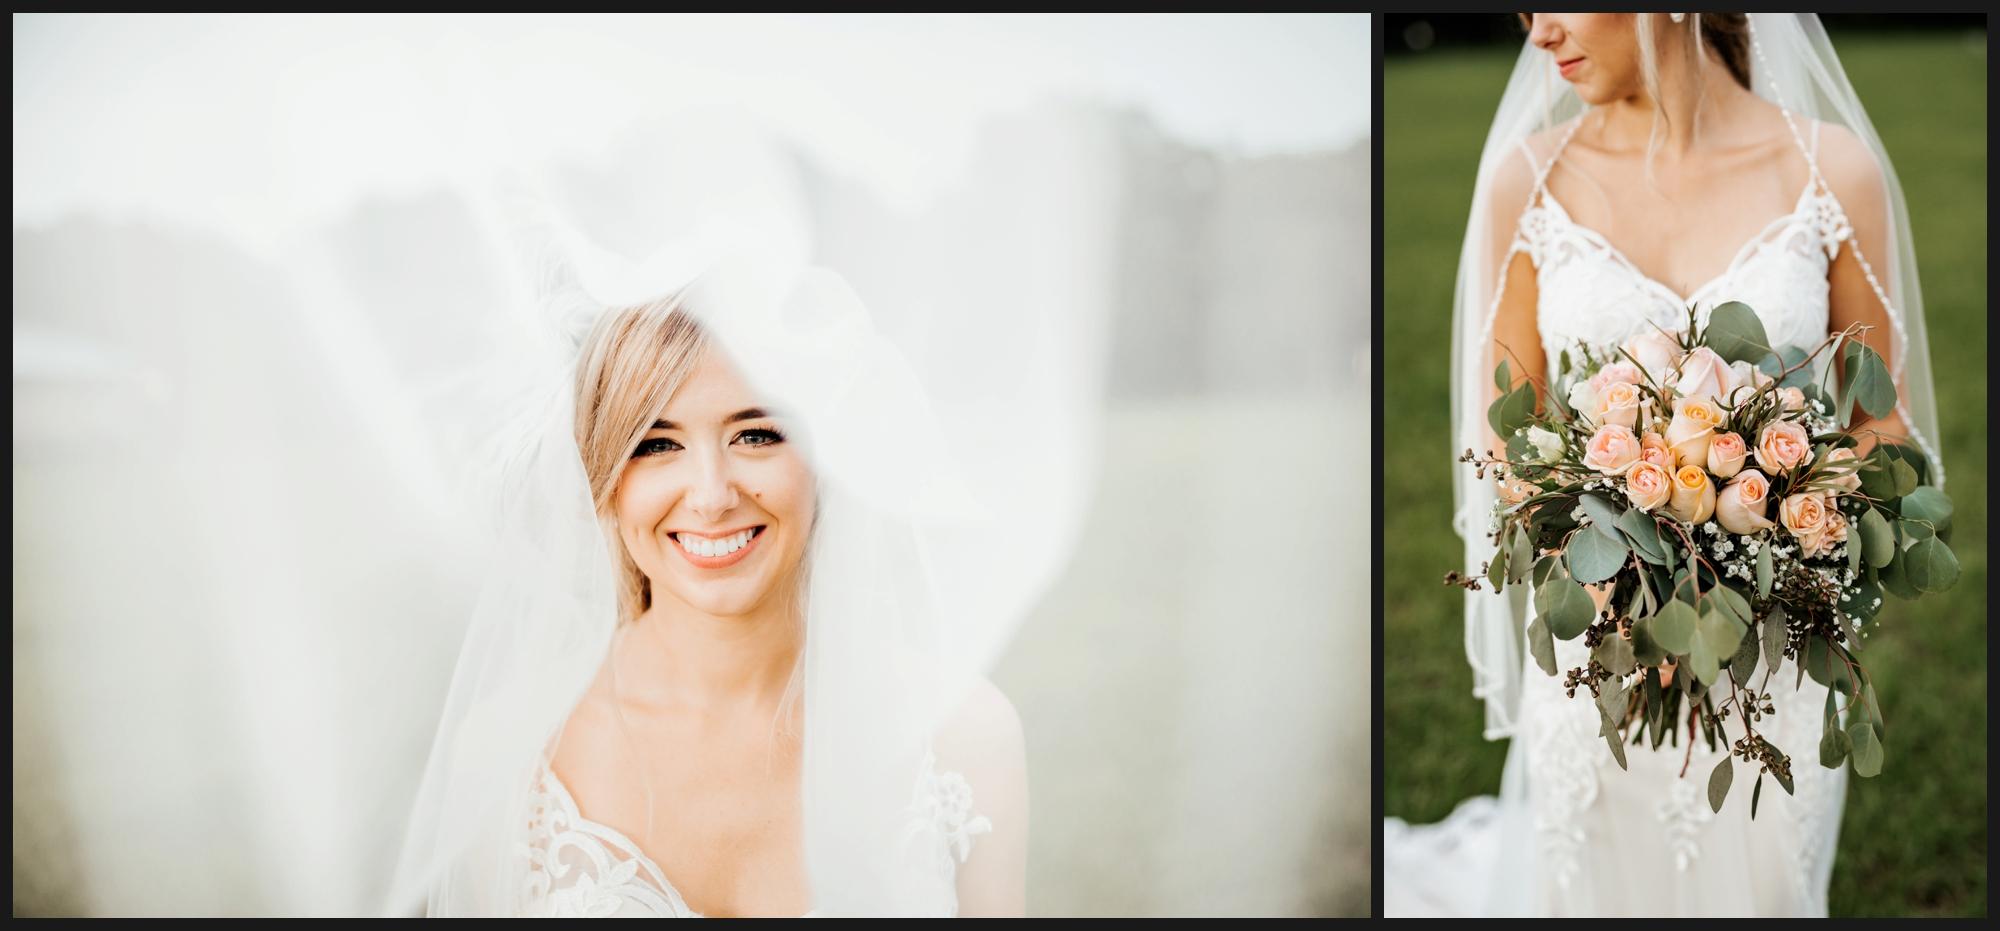 Orlando-Wedding-Photographer-destination-wedding-photographer-florida-wedding-photographer-hawaii-wedding-photographer_0267.jpg